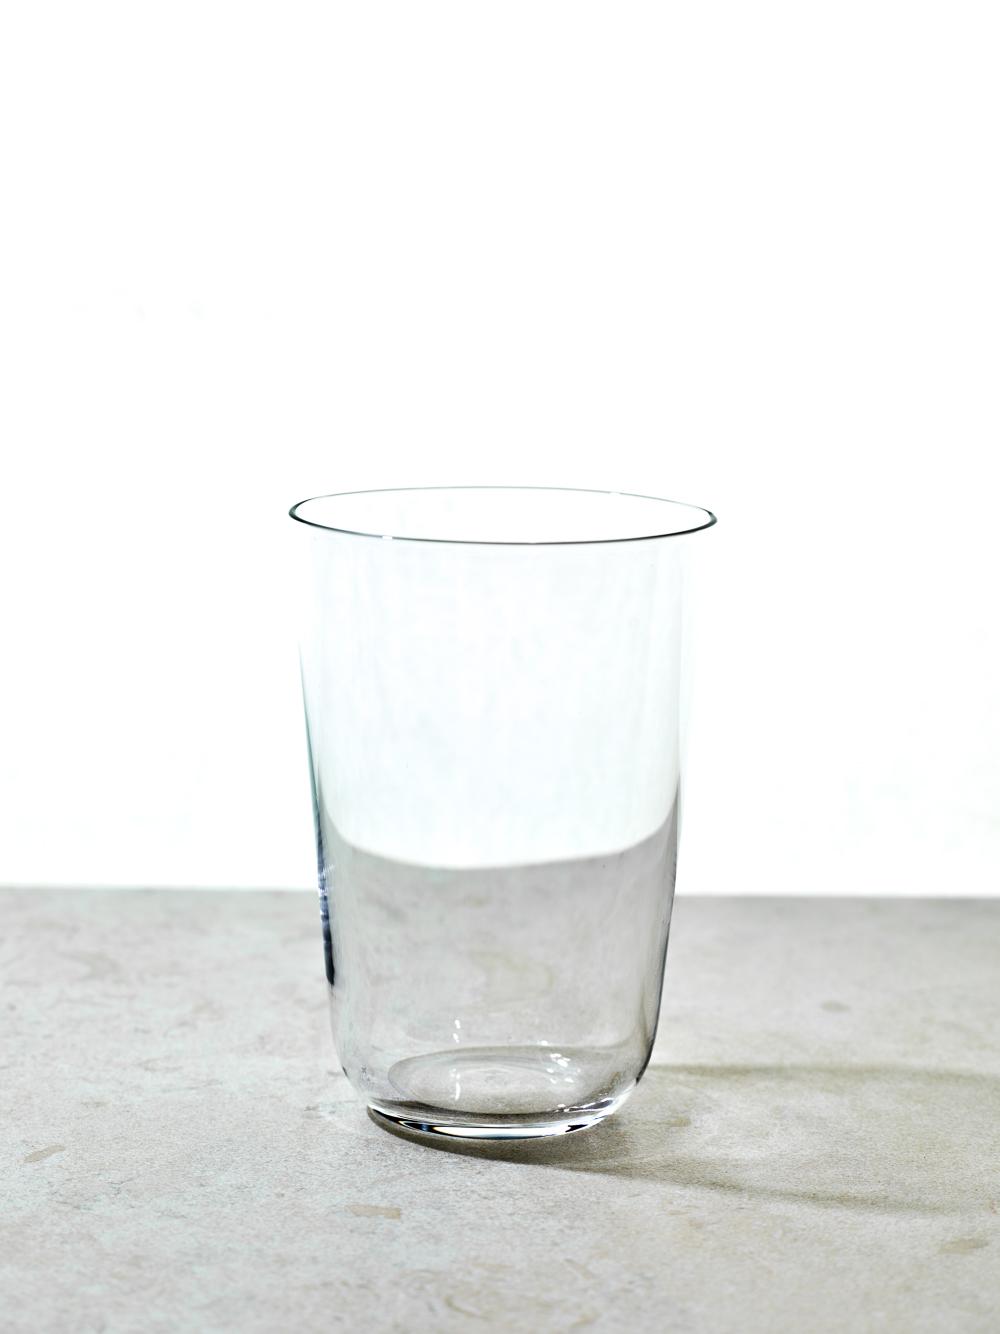 Glas högt